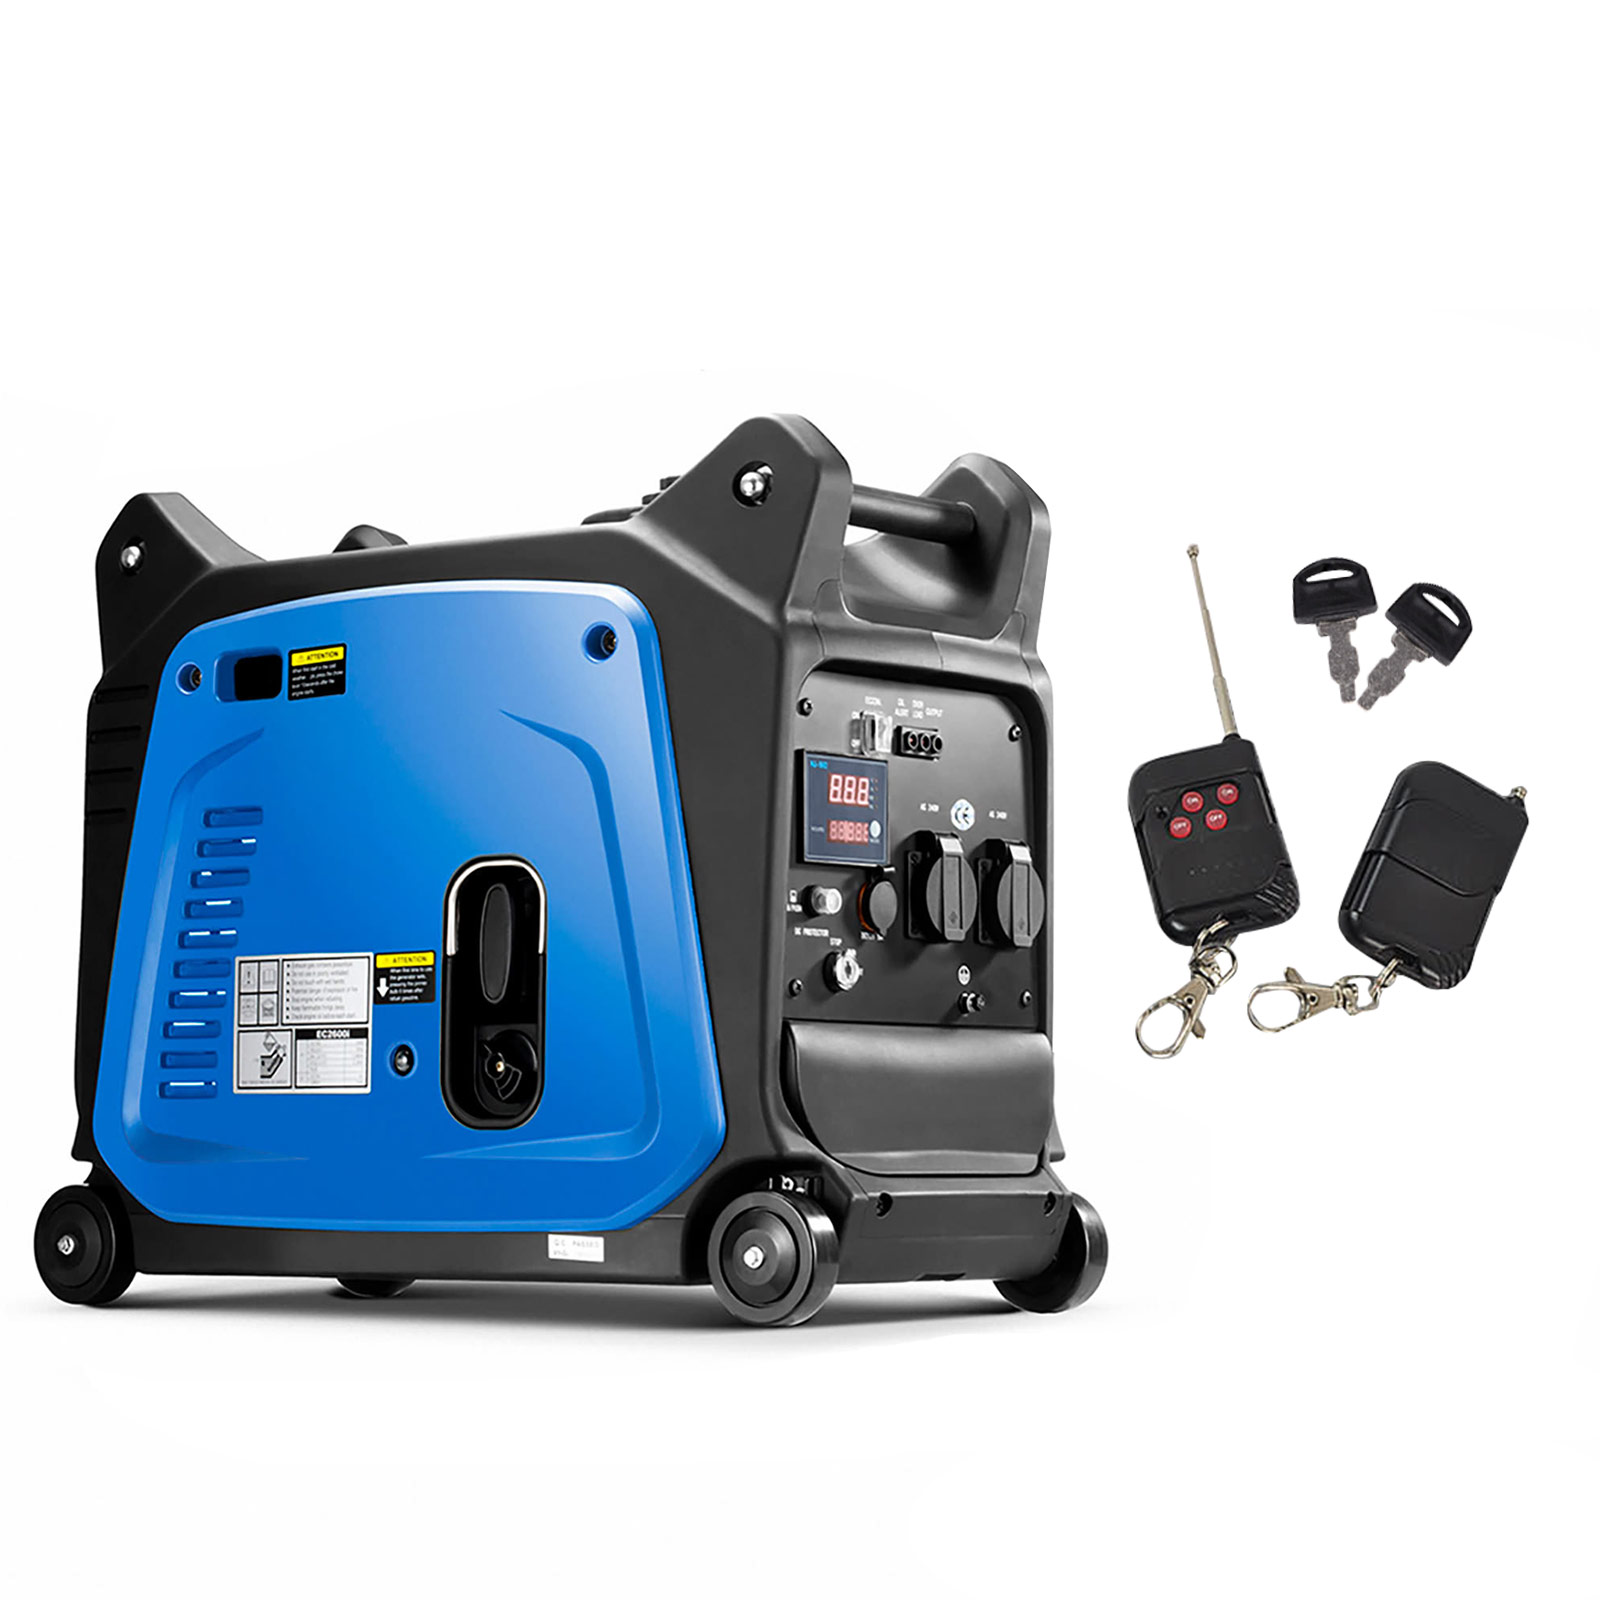 GenTrax Inverter Generator 3.5KW Max 12v Remote Start Portable Petrol Camping